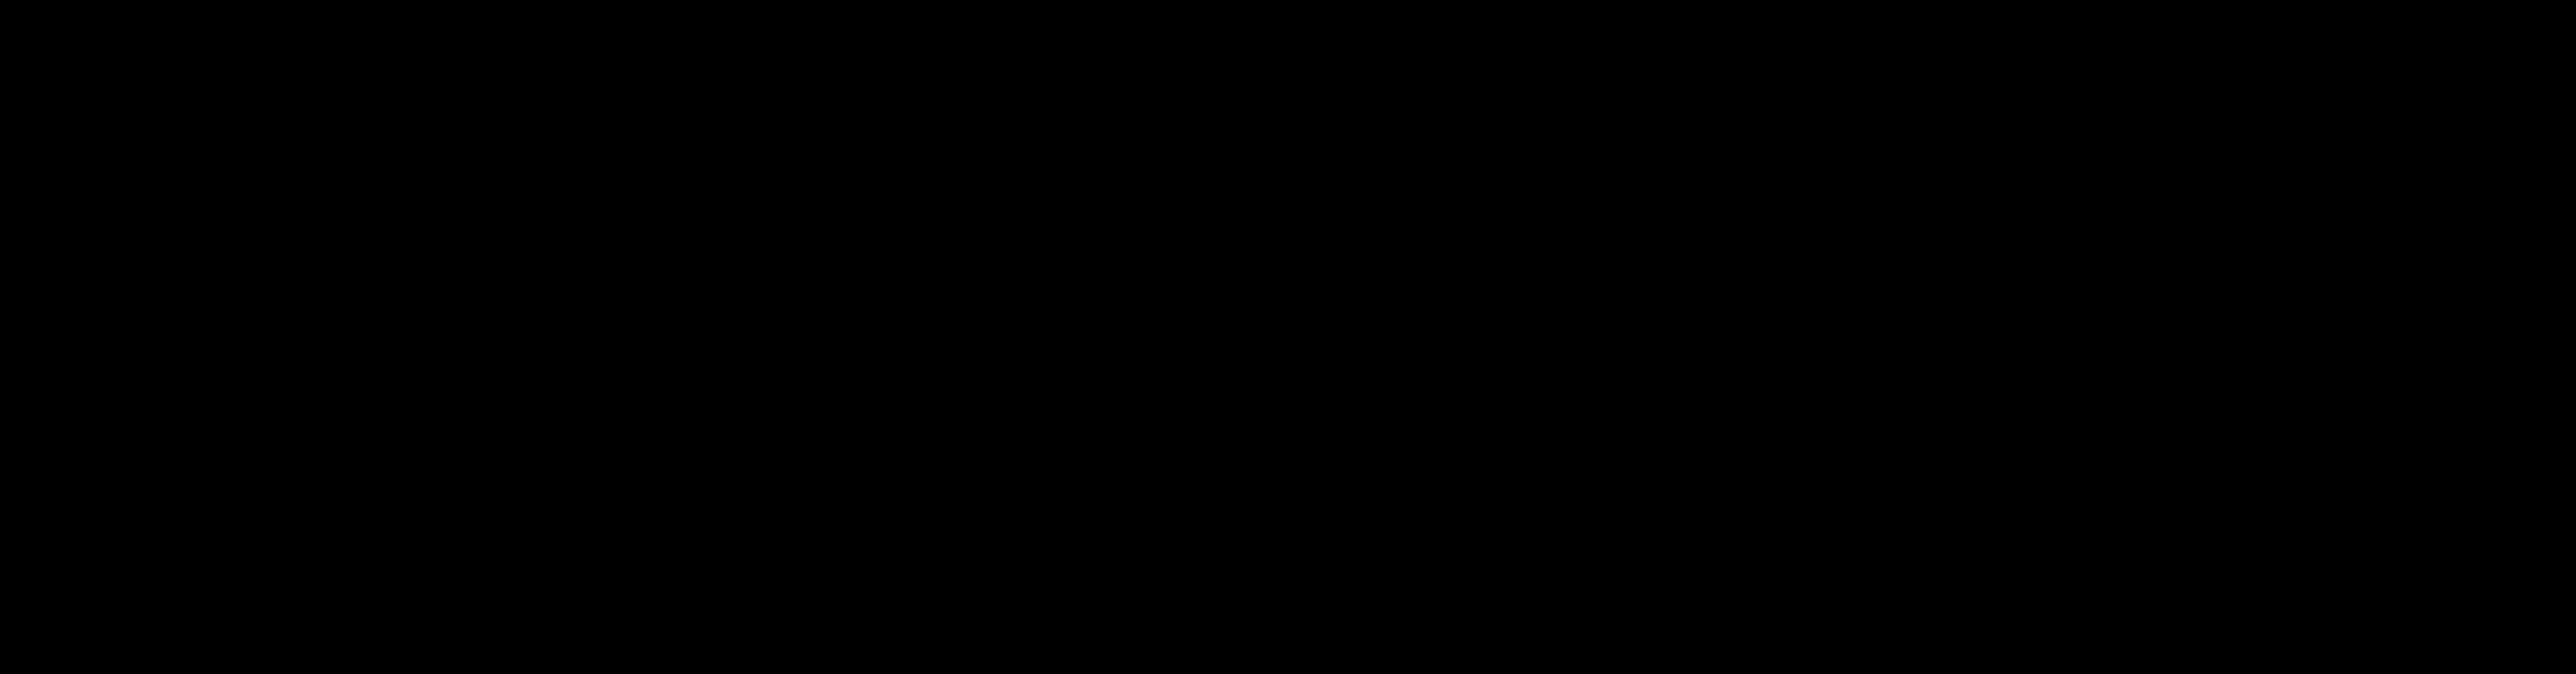 Variant – Car Trailer – Full Steel Floor 3504 A4 (599x245x93 cm)